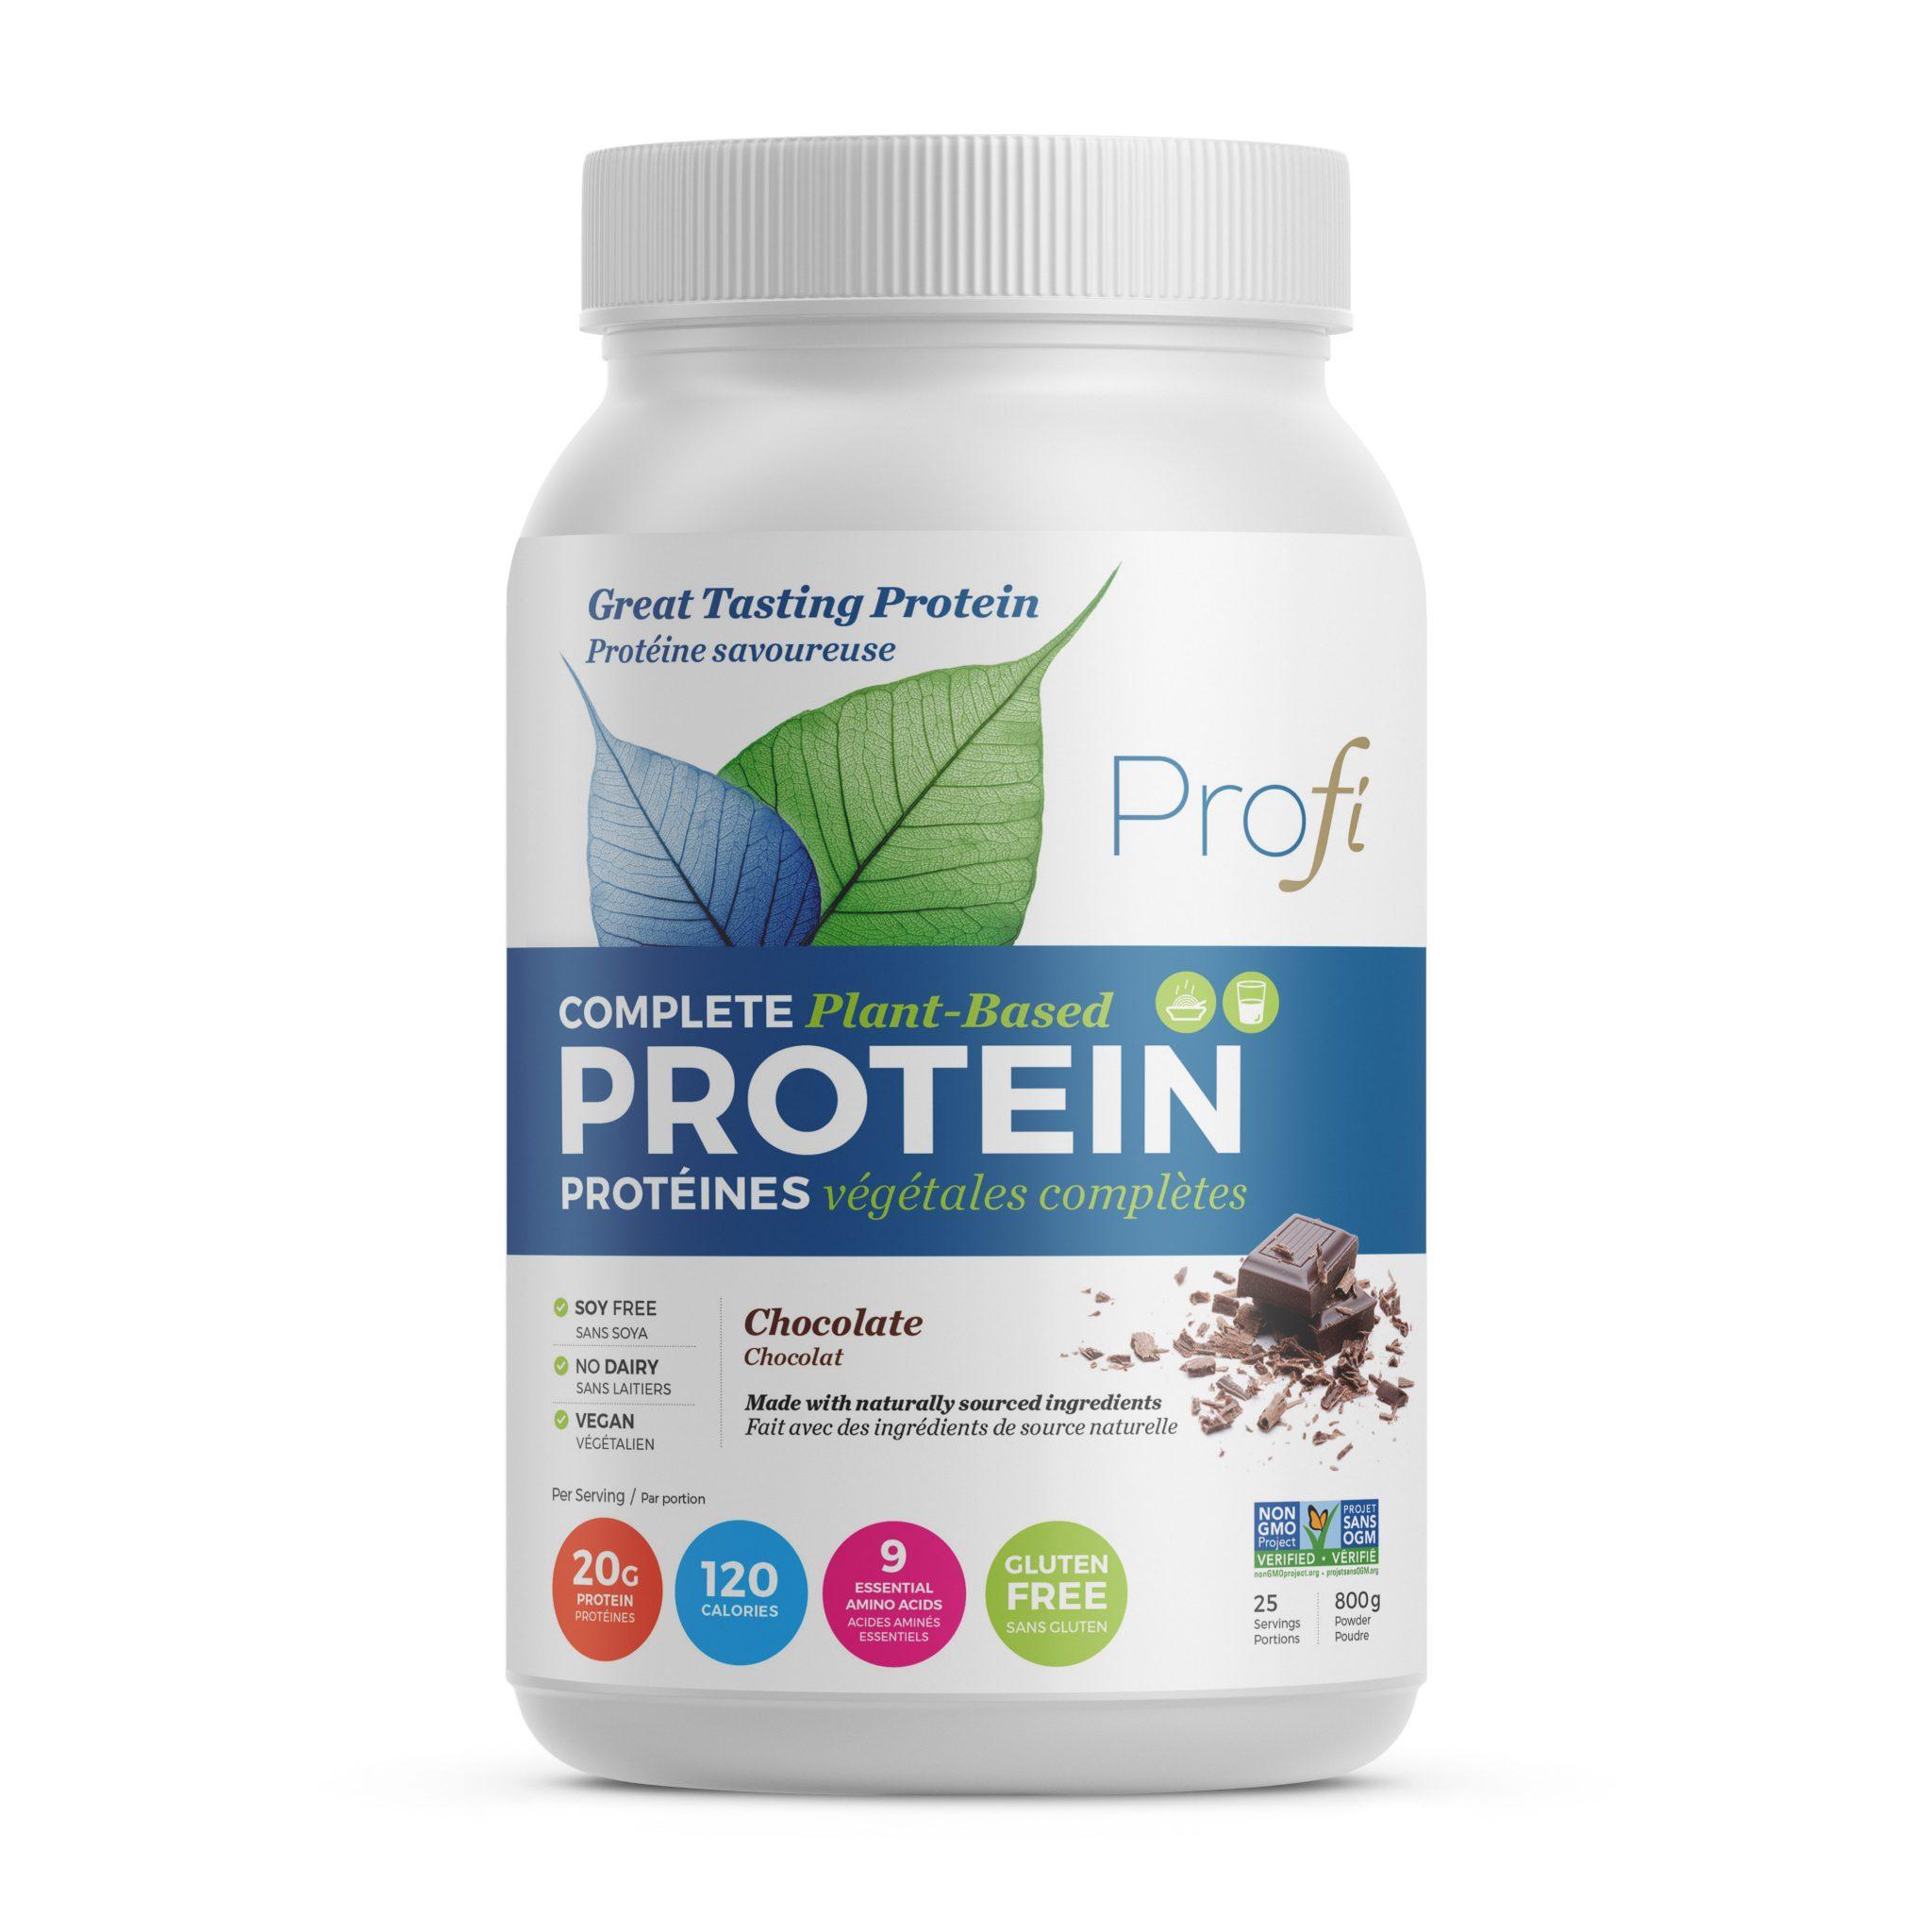 f54c0726be Chocolate Protein Powder | PROFI